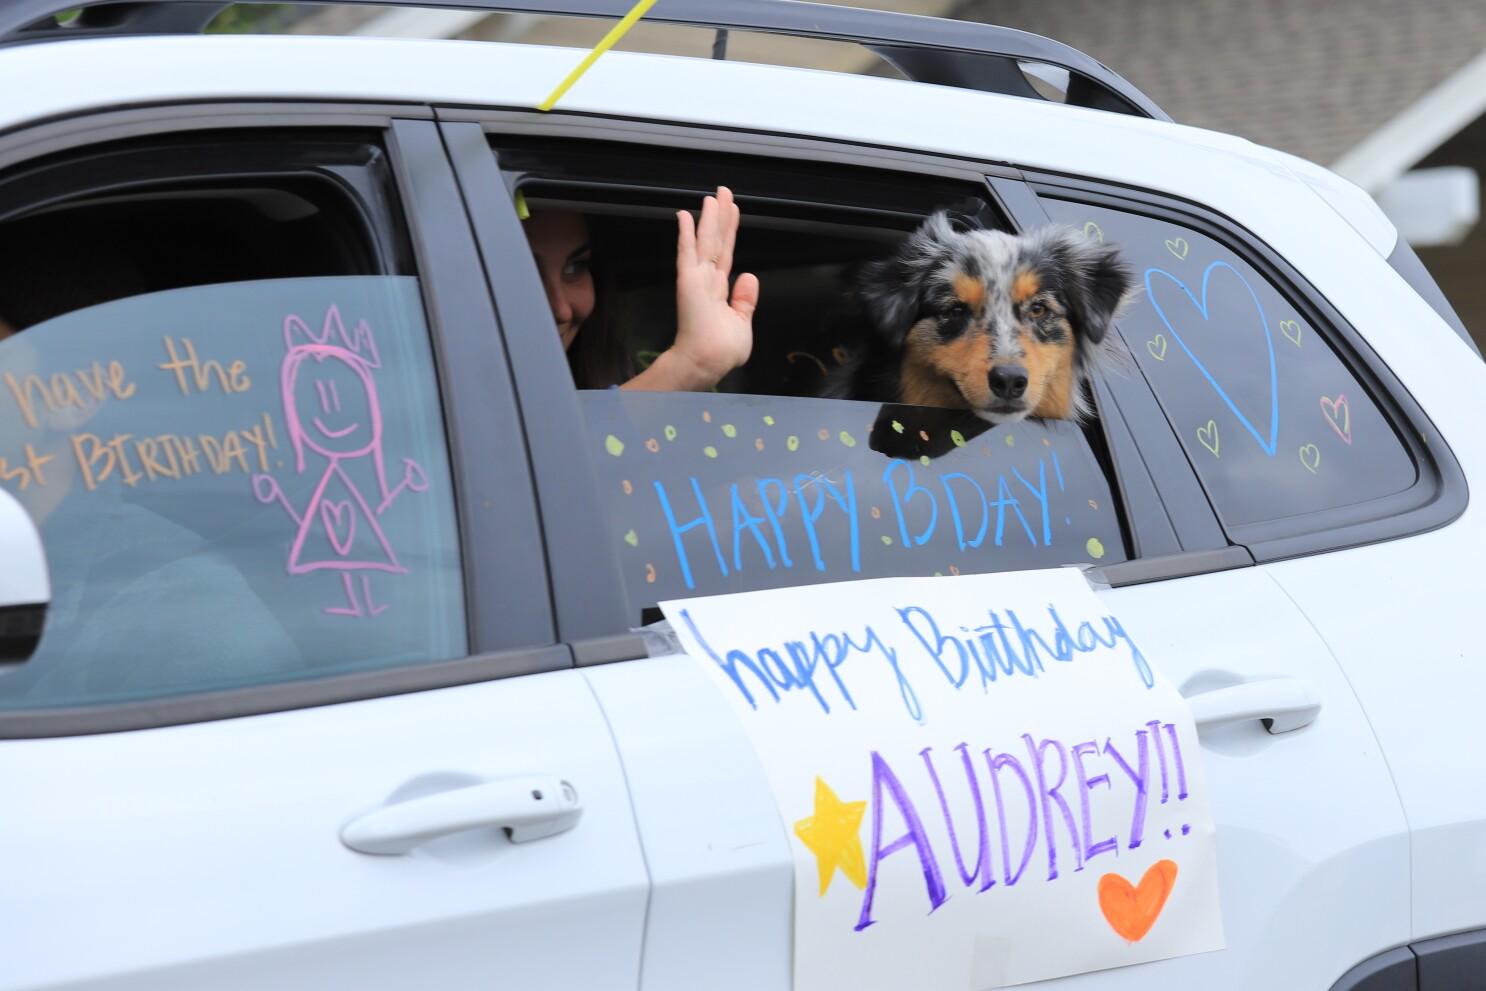 Drive By Birthdays Replacing Traditional Milestone Celebrations The San Diego Union Tribune